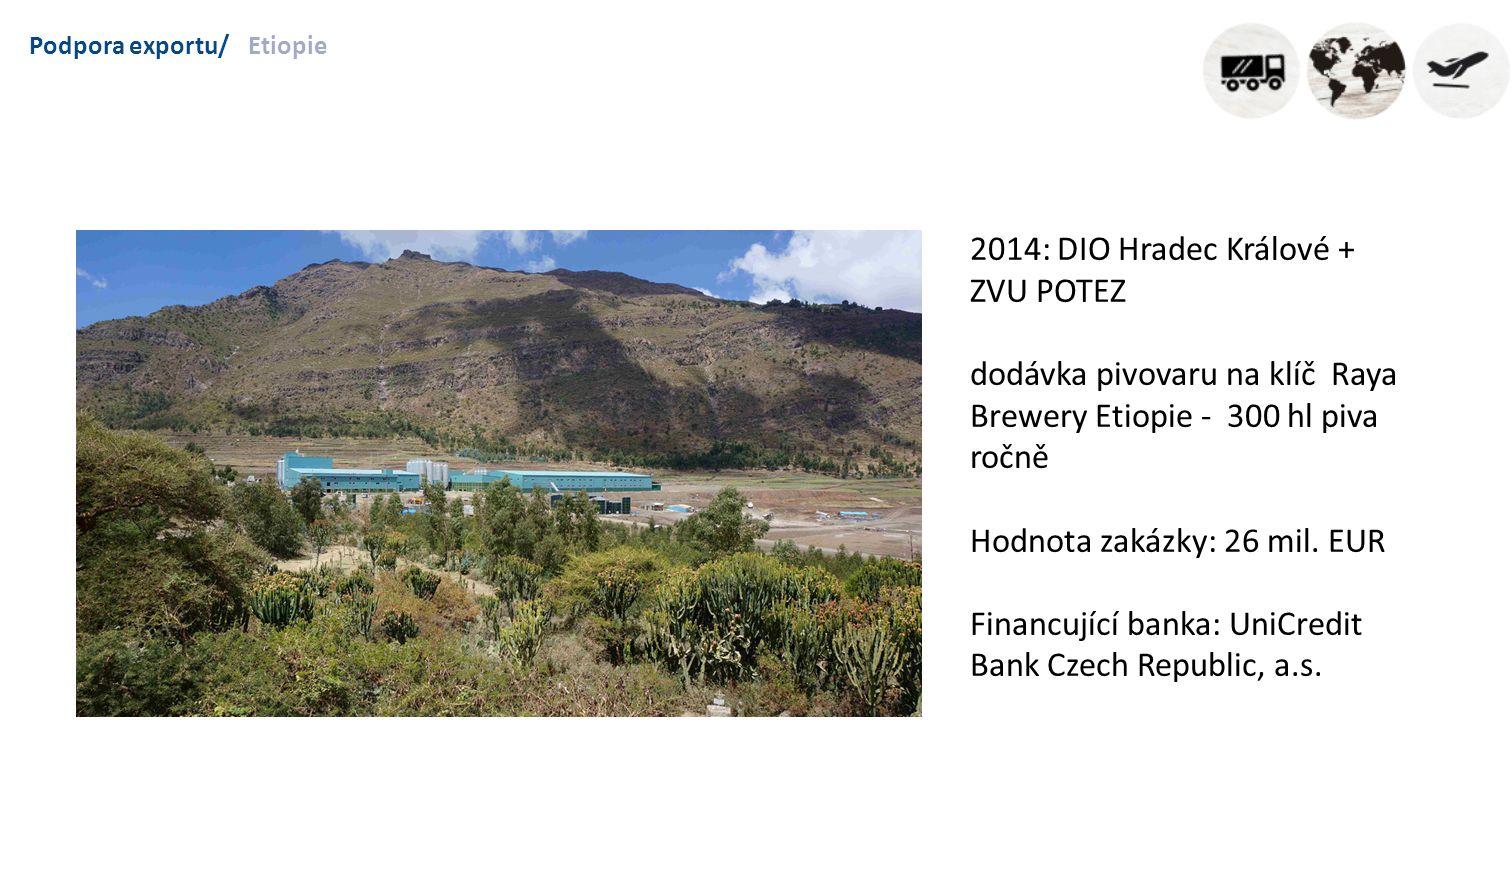 Podpora exportu/Etiopie 2014: DIO Hradec Králové + ZVU POTEZ dodávka pivovaru na klíč Raya Brewery Etiopie - 300 hl piva ročně Hodnota zakázky: 26 mil.